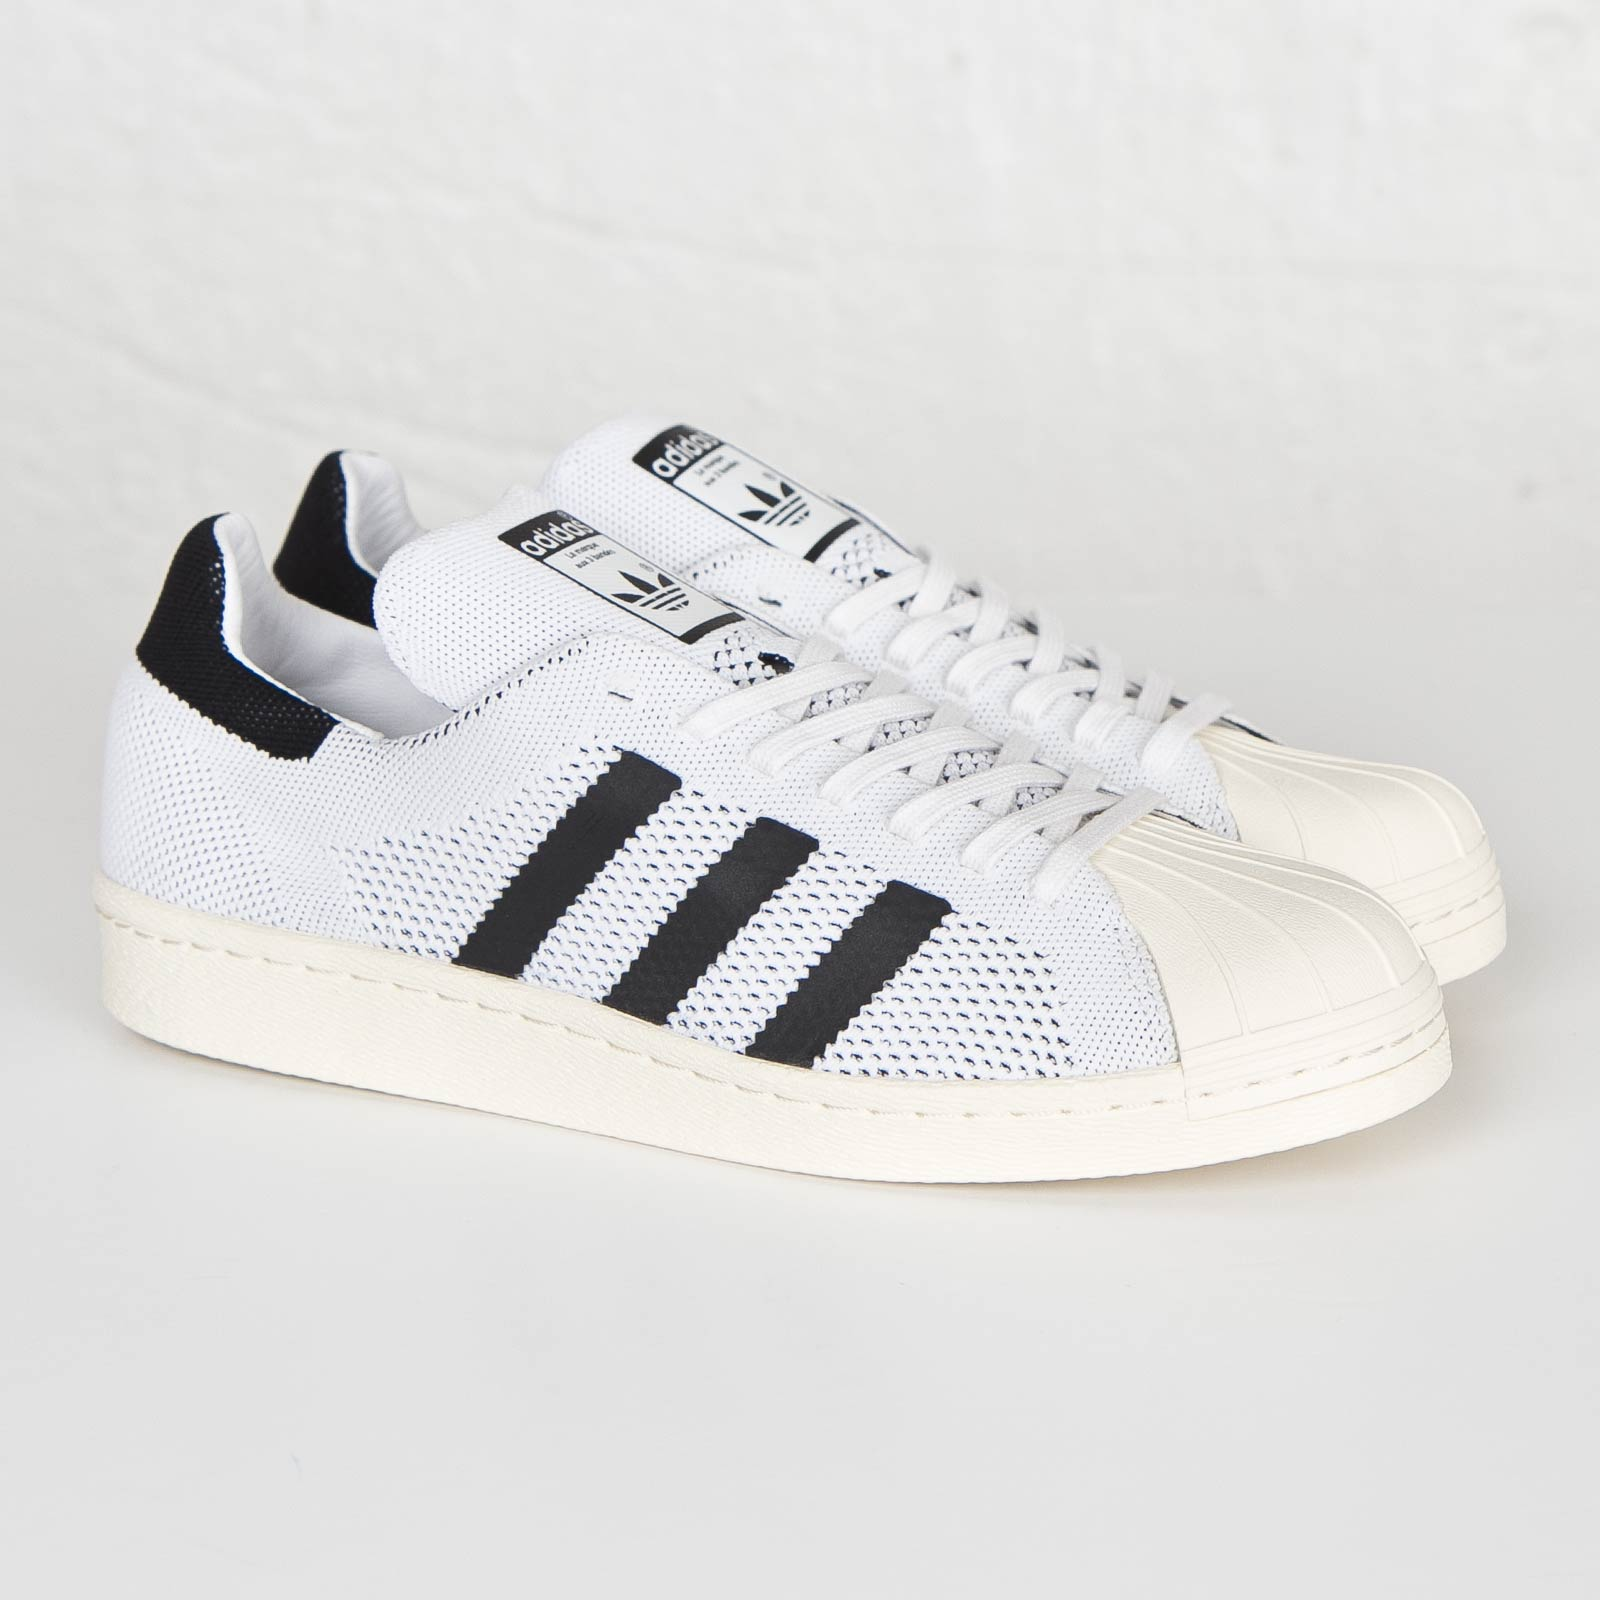 cheap for discount 73901 70971 adidas Superstar 80s Primeknit